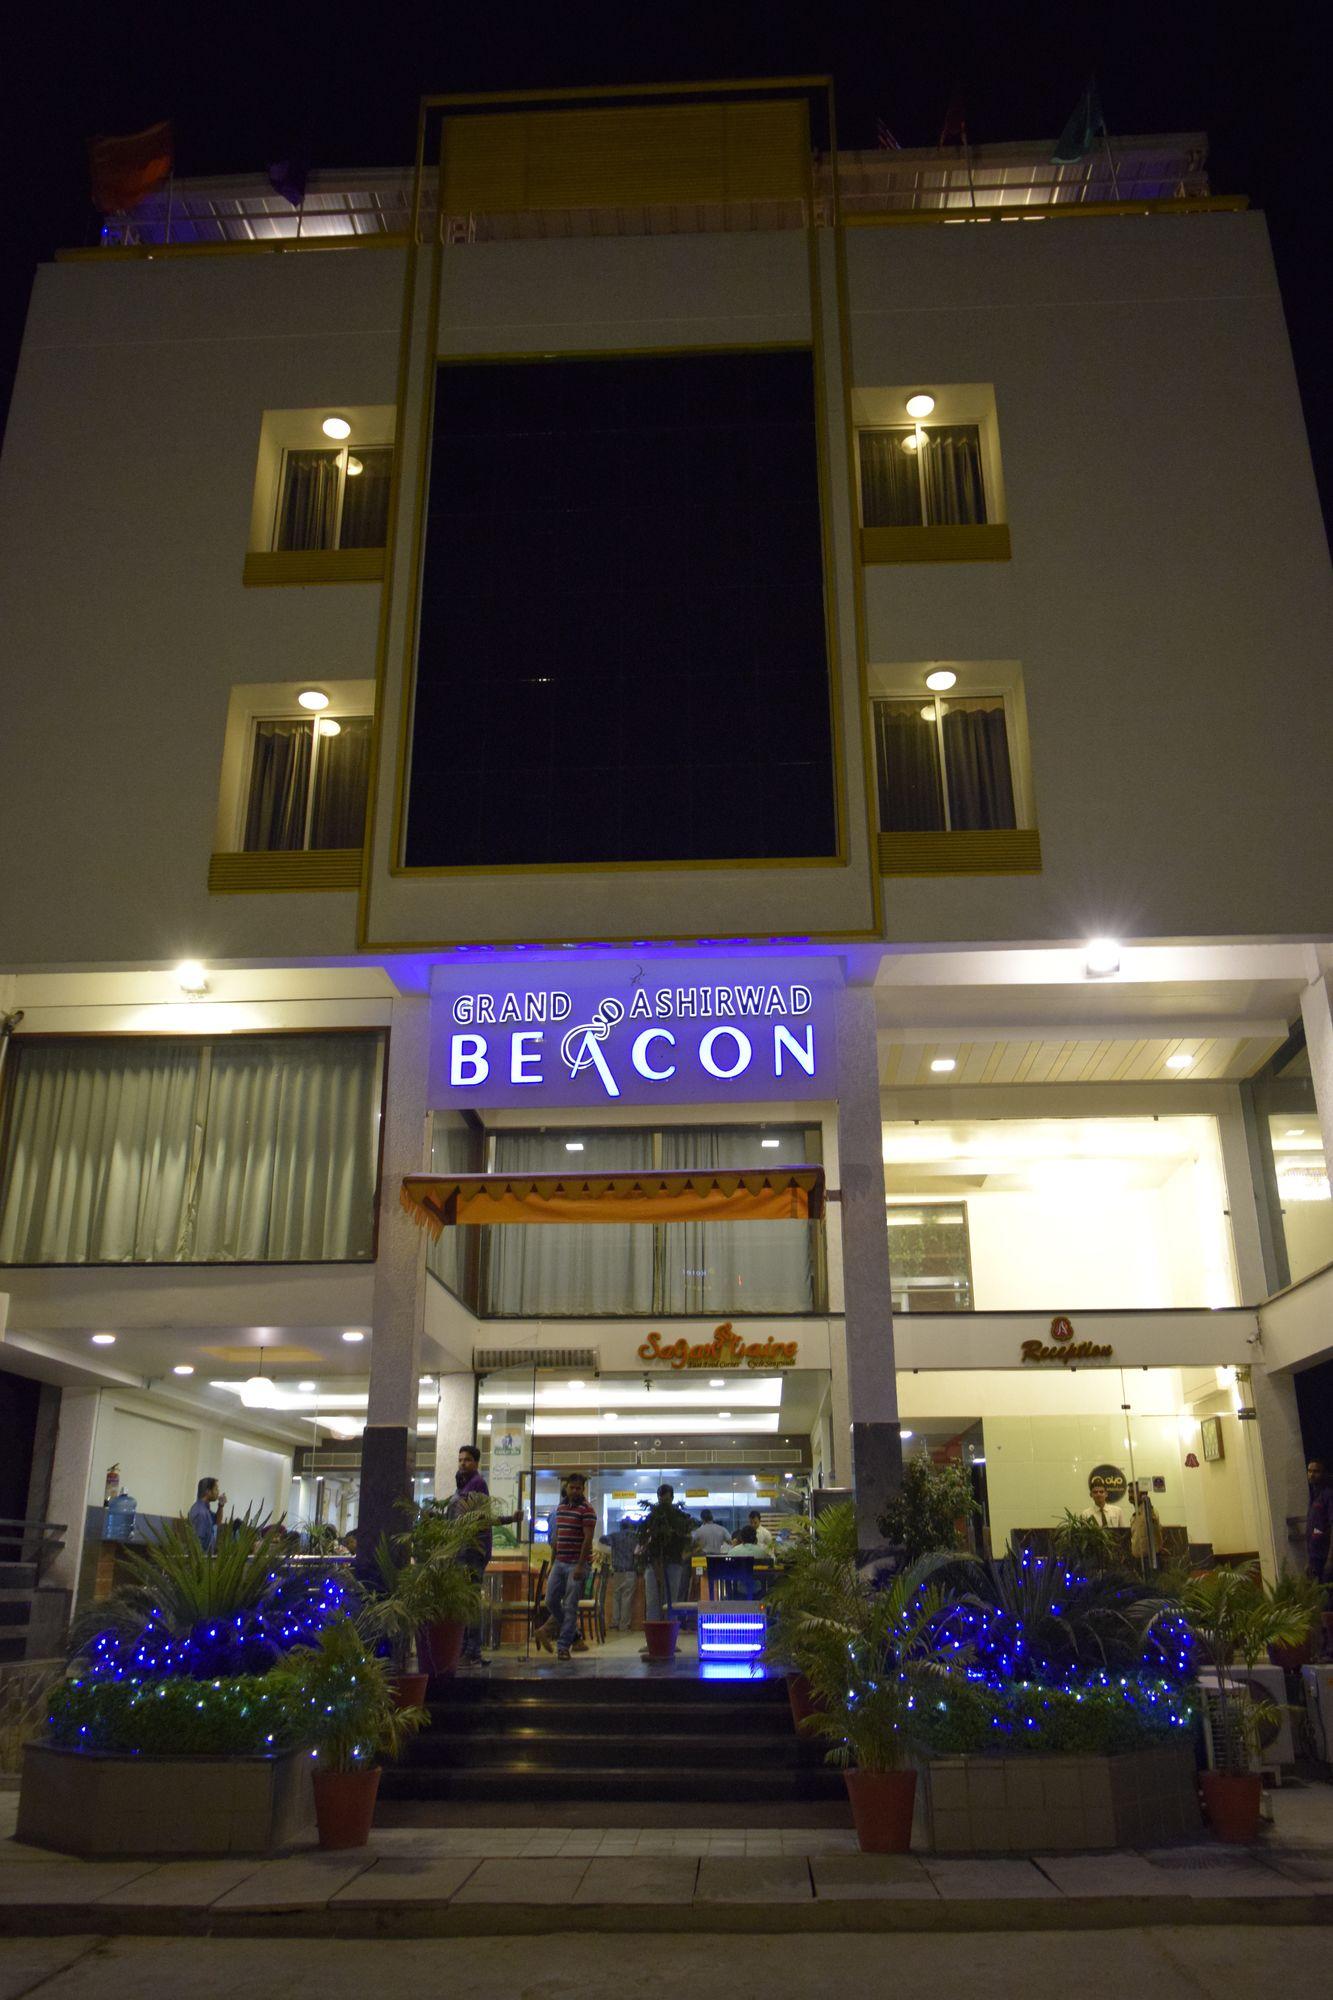 Best Budget Hotel To Stay In Bhopal-Hotel Grand Ashirwad Beacon